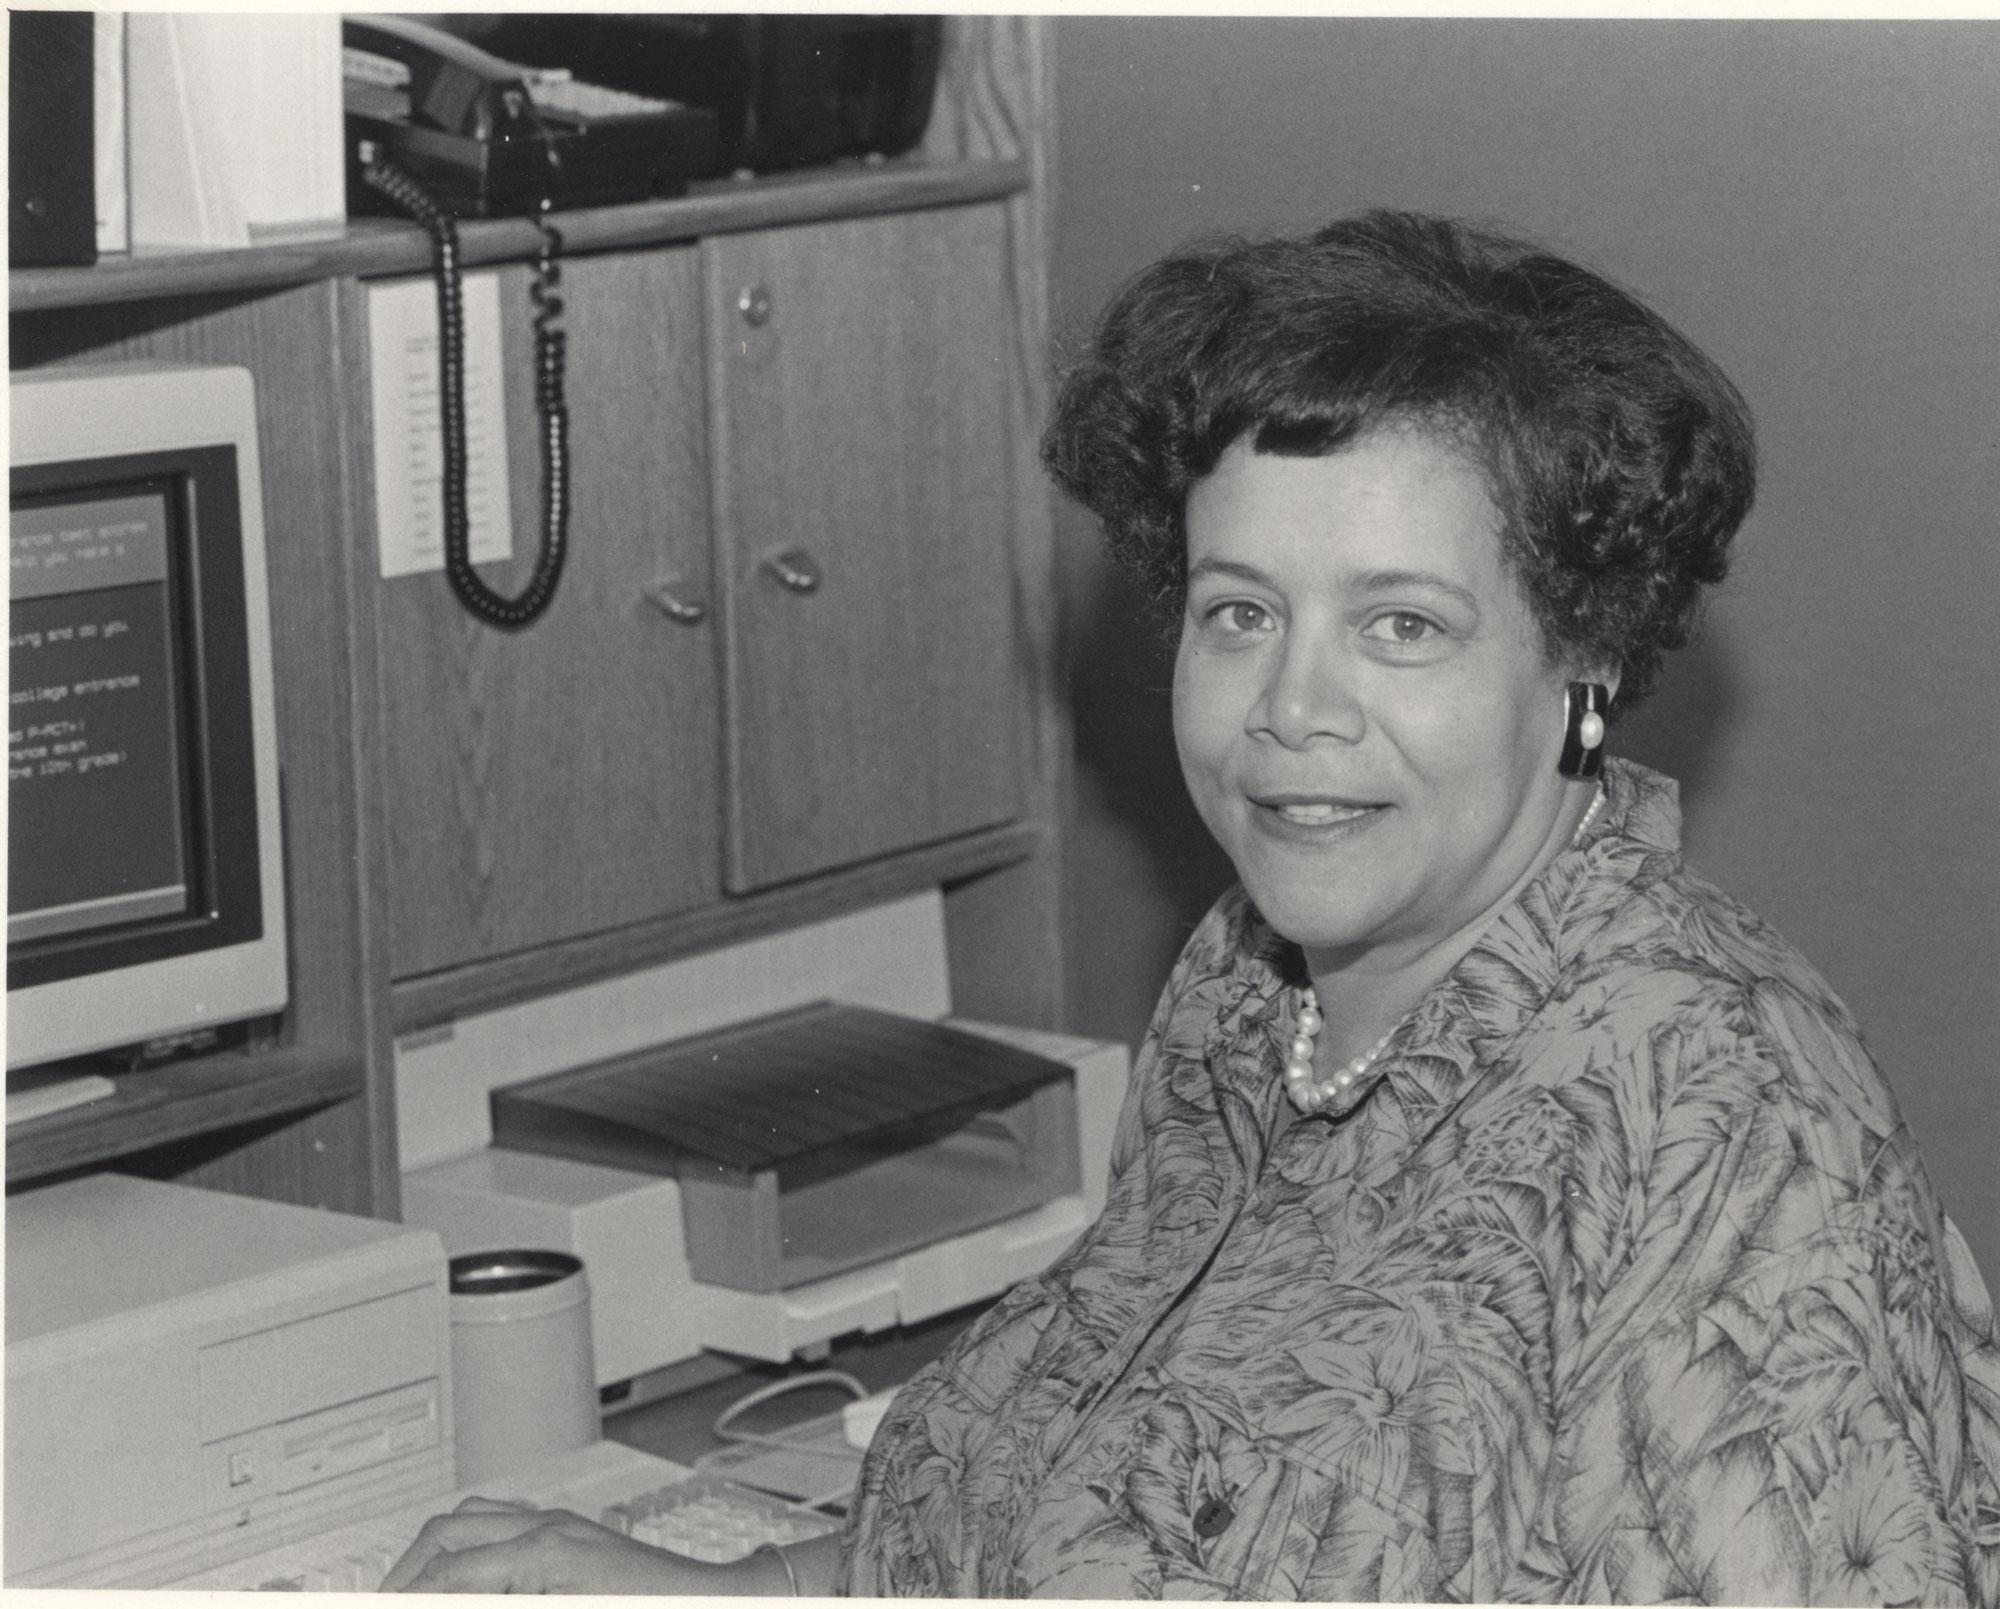 Barbara Matthews, SCSU's associate director emeritus of counseling